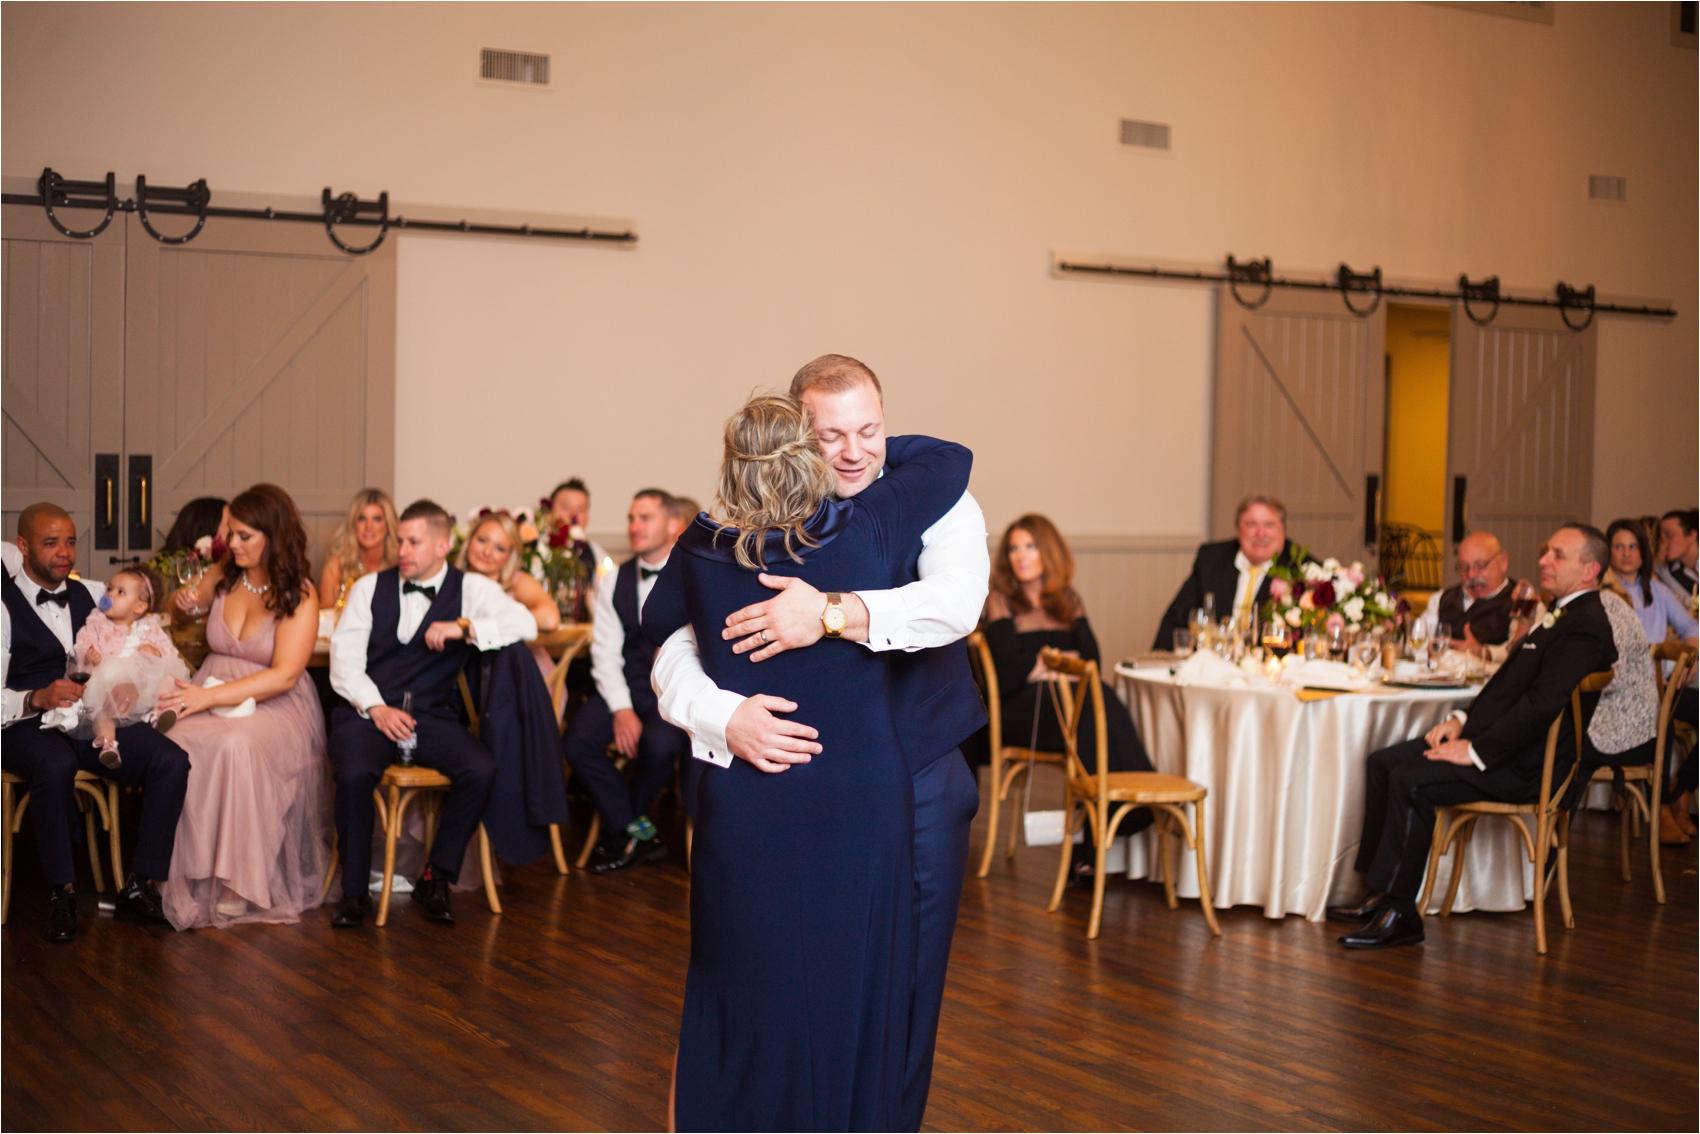 King-Family-Vineyard-Spring-Virginia-Wedding-2170.jpg